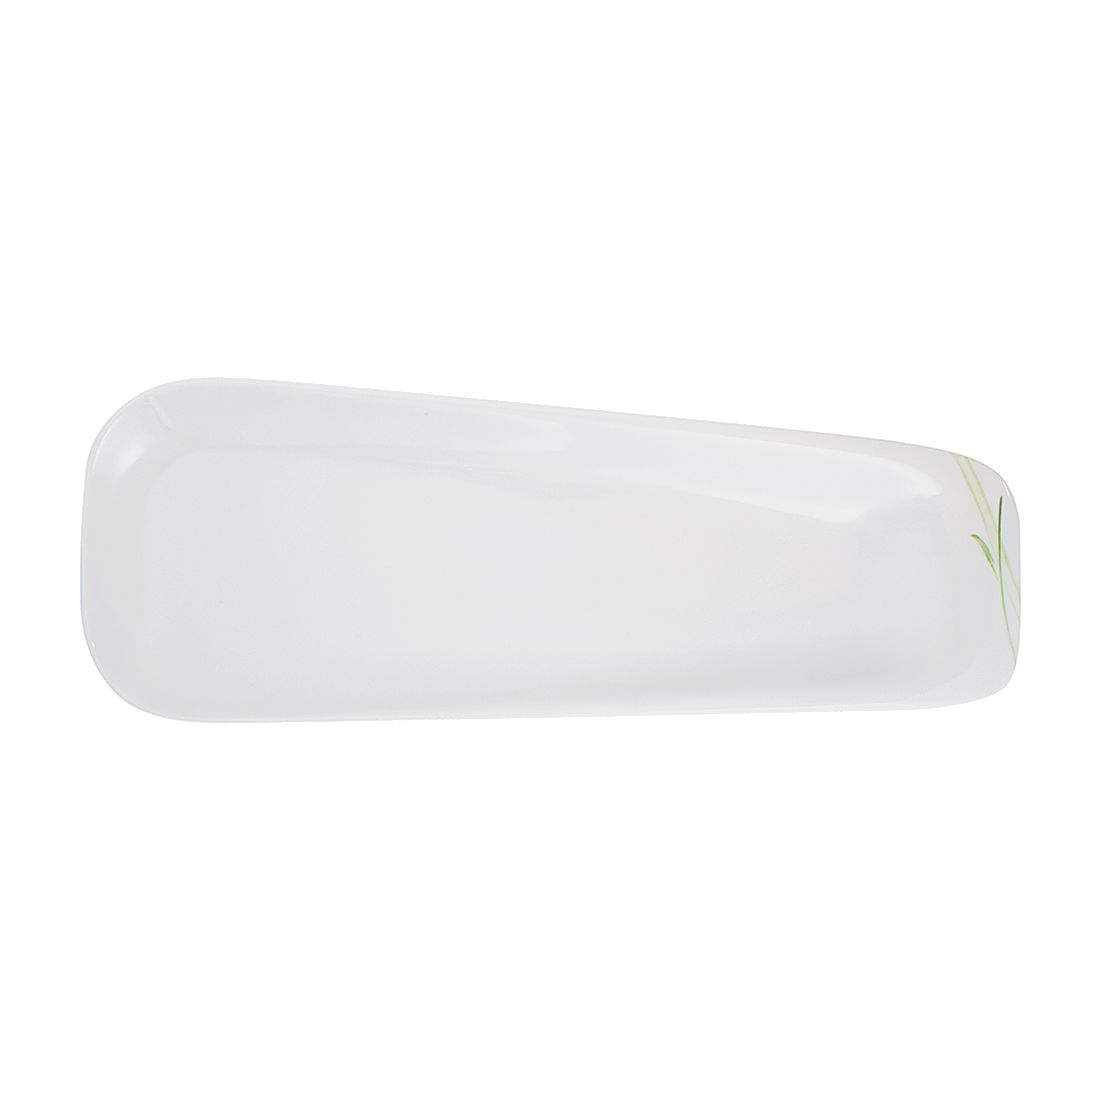 Platte Elixyr Joia (extralang) – Weiß, Kahla günstig